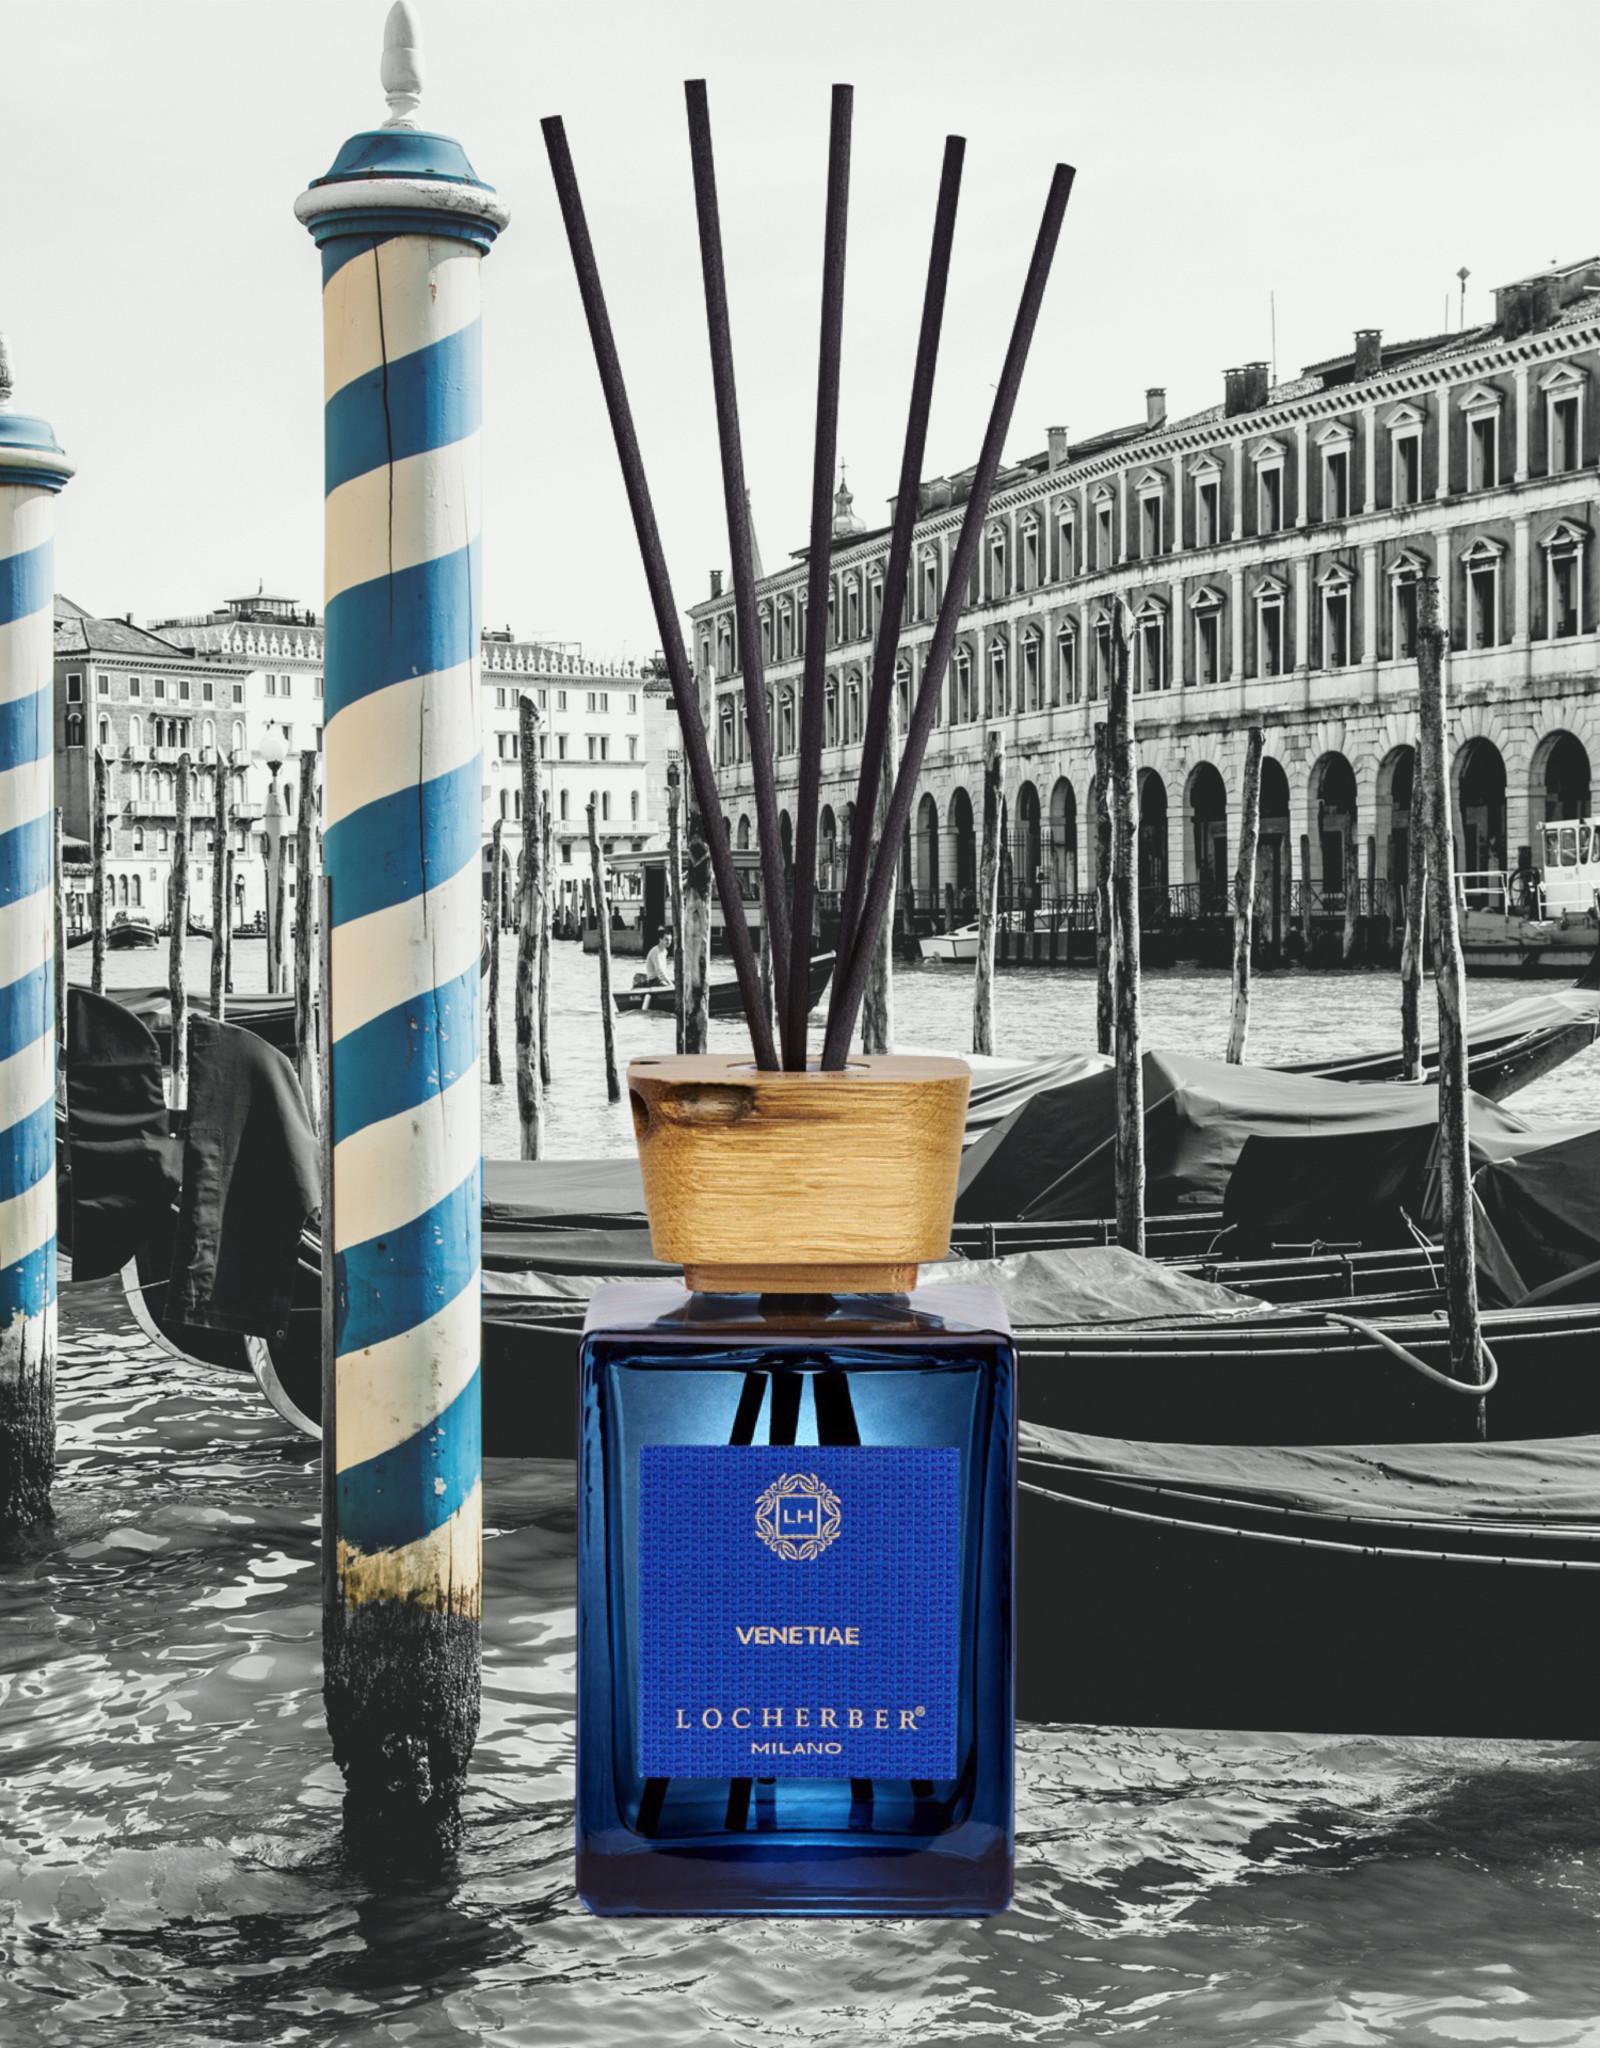 Locherber Locherber Milano - Venetiae - Gift Box